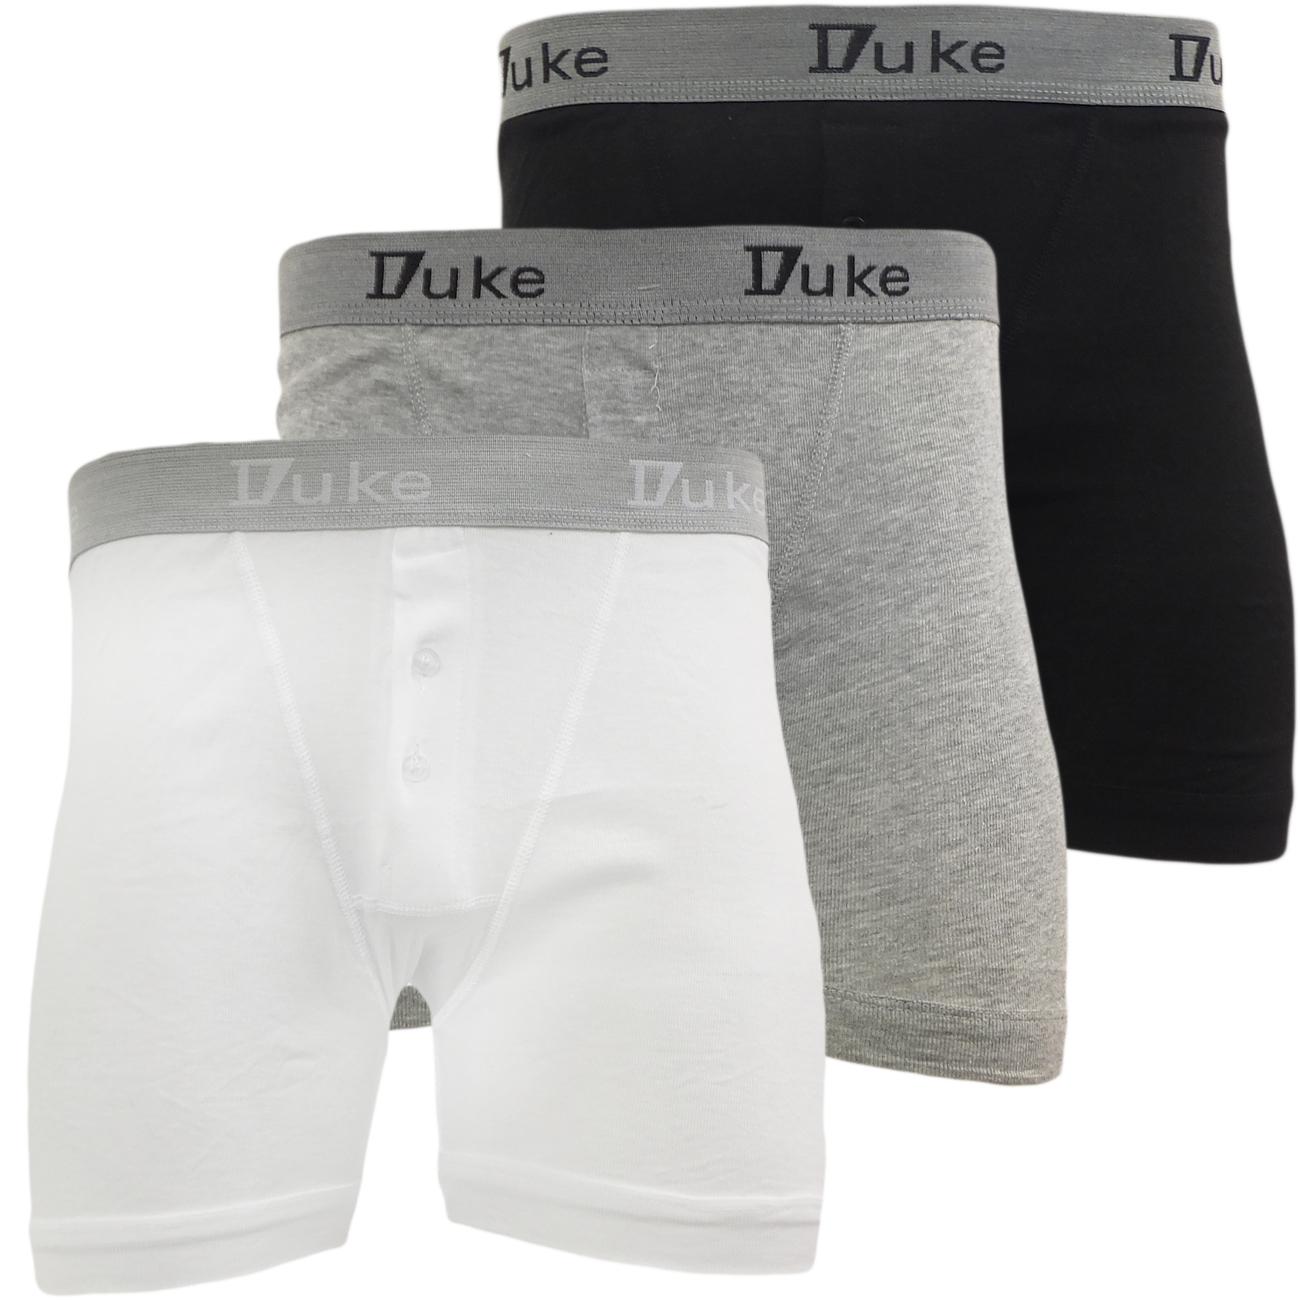 Mens Duke Underwear